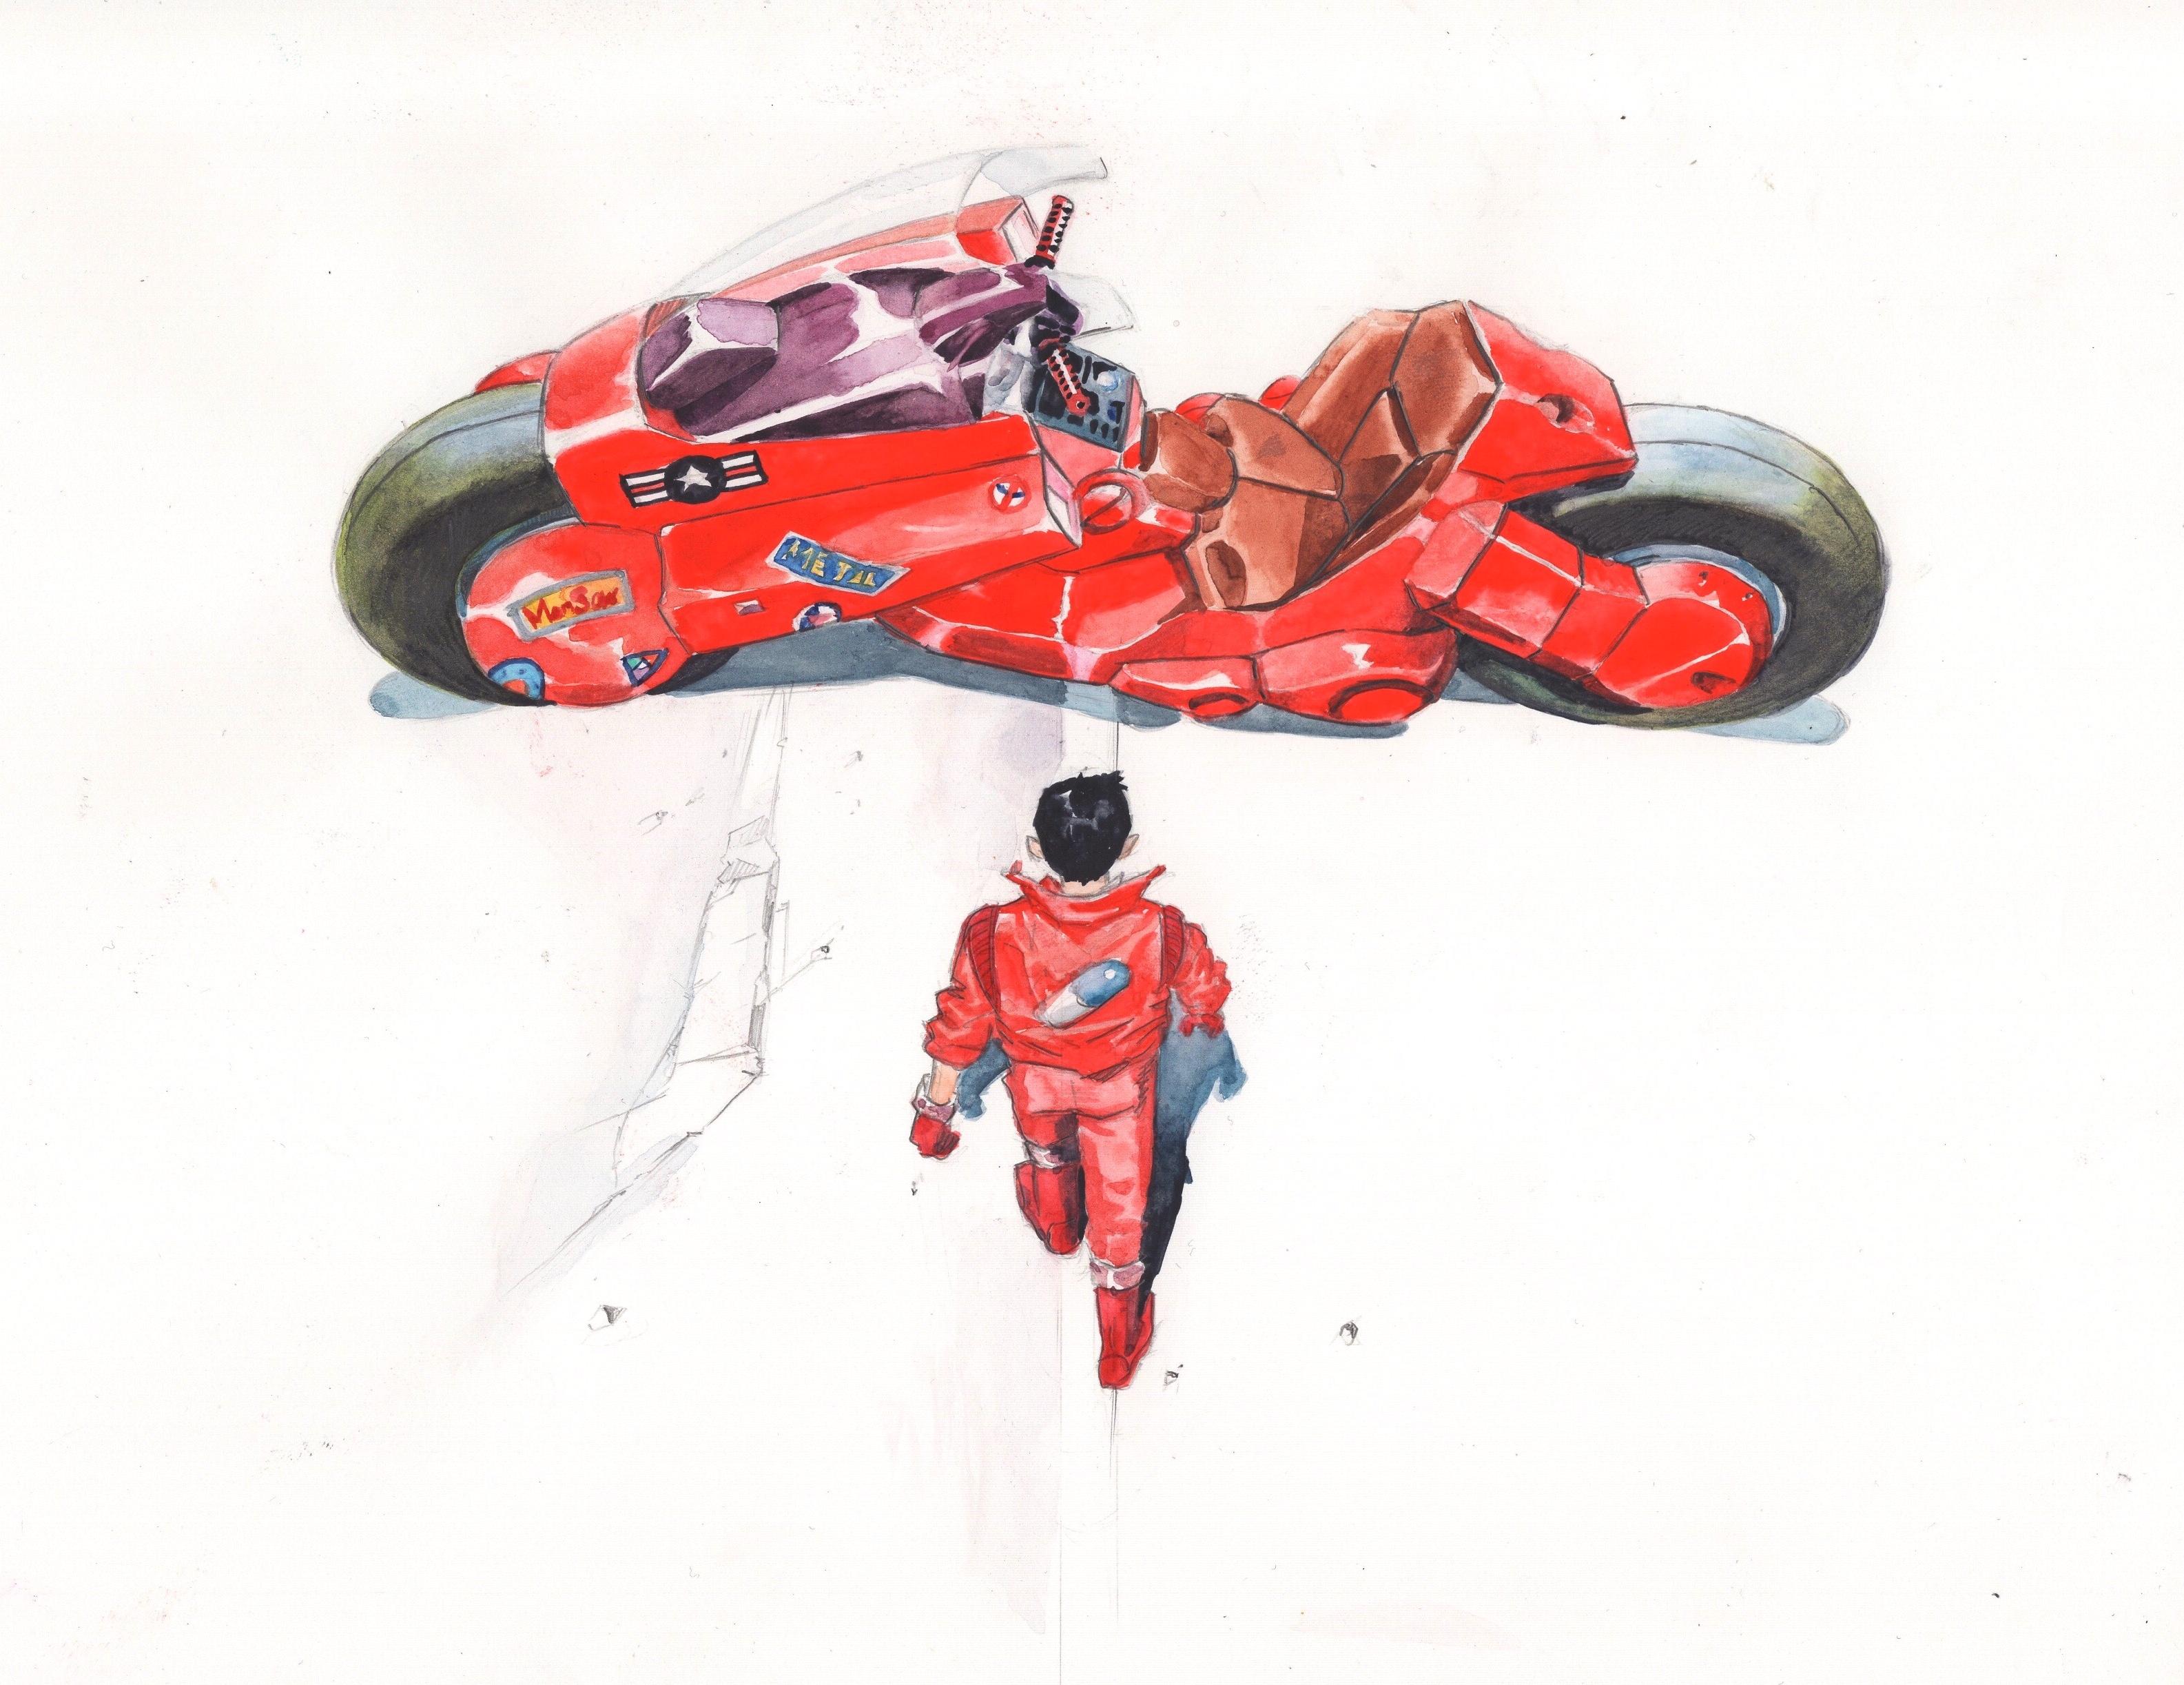 AKIRA 金田のバイク